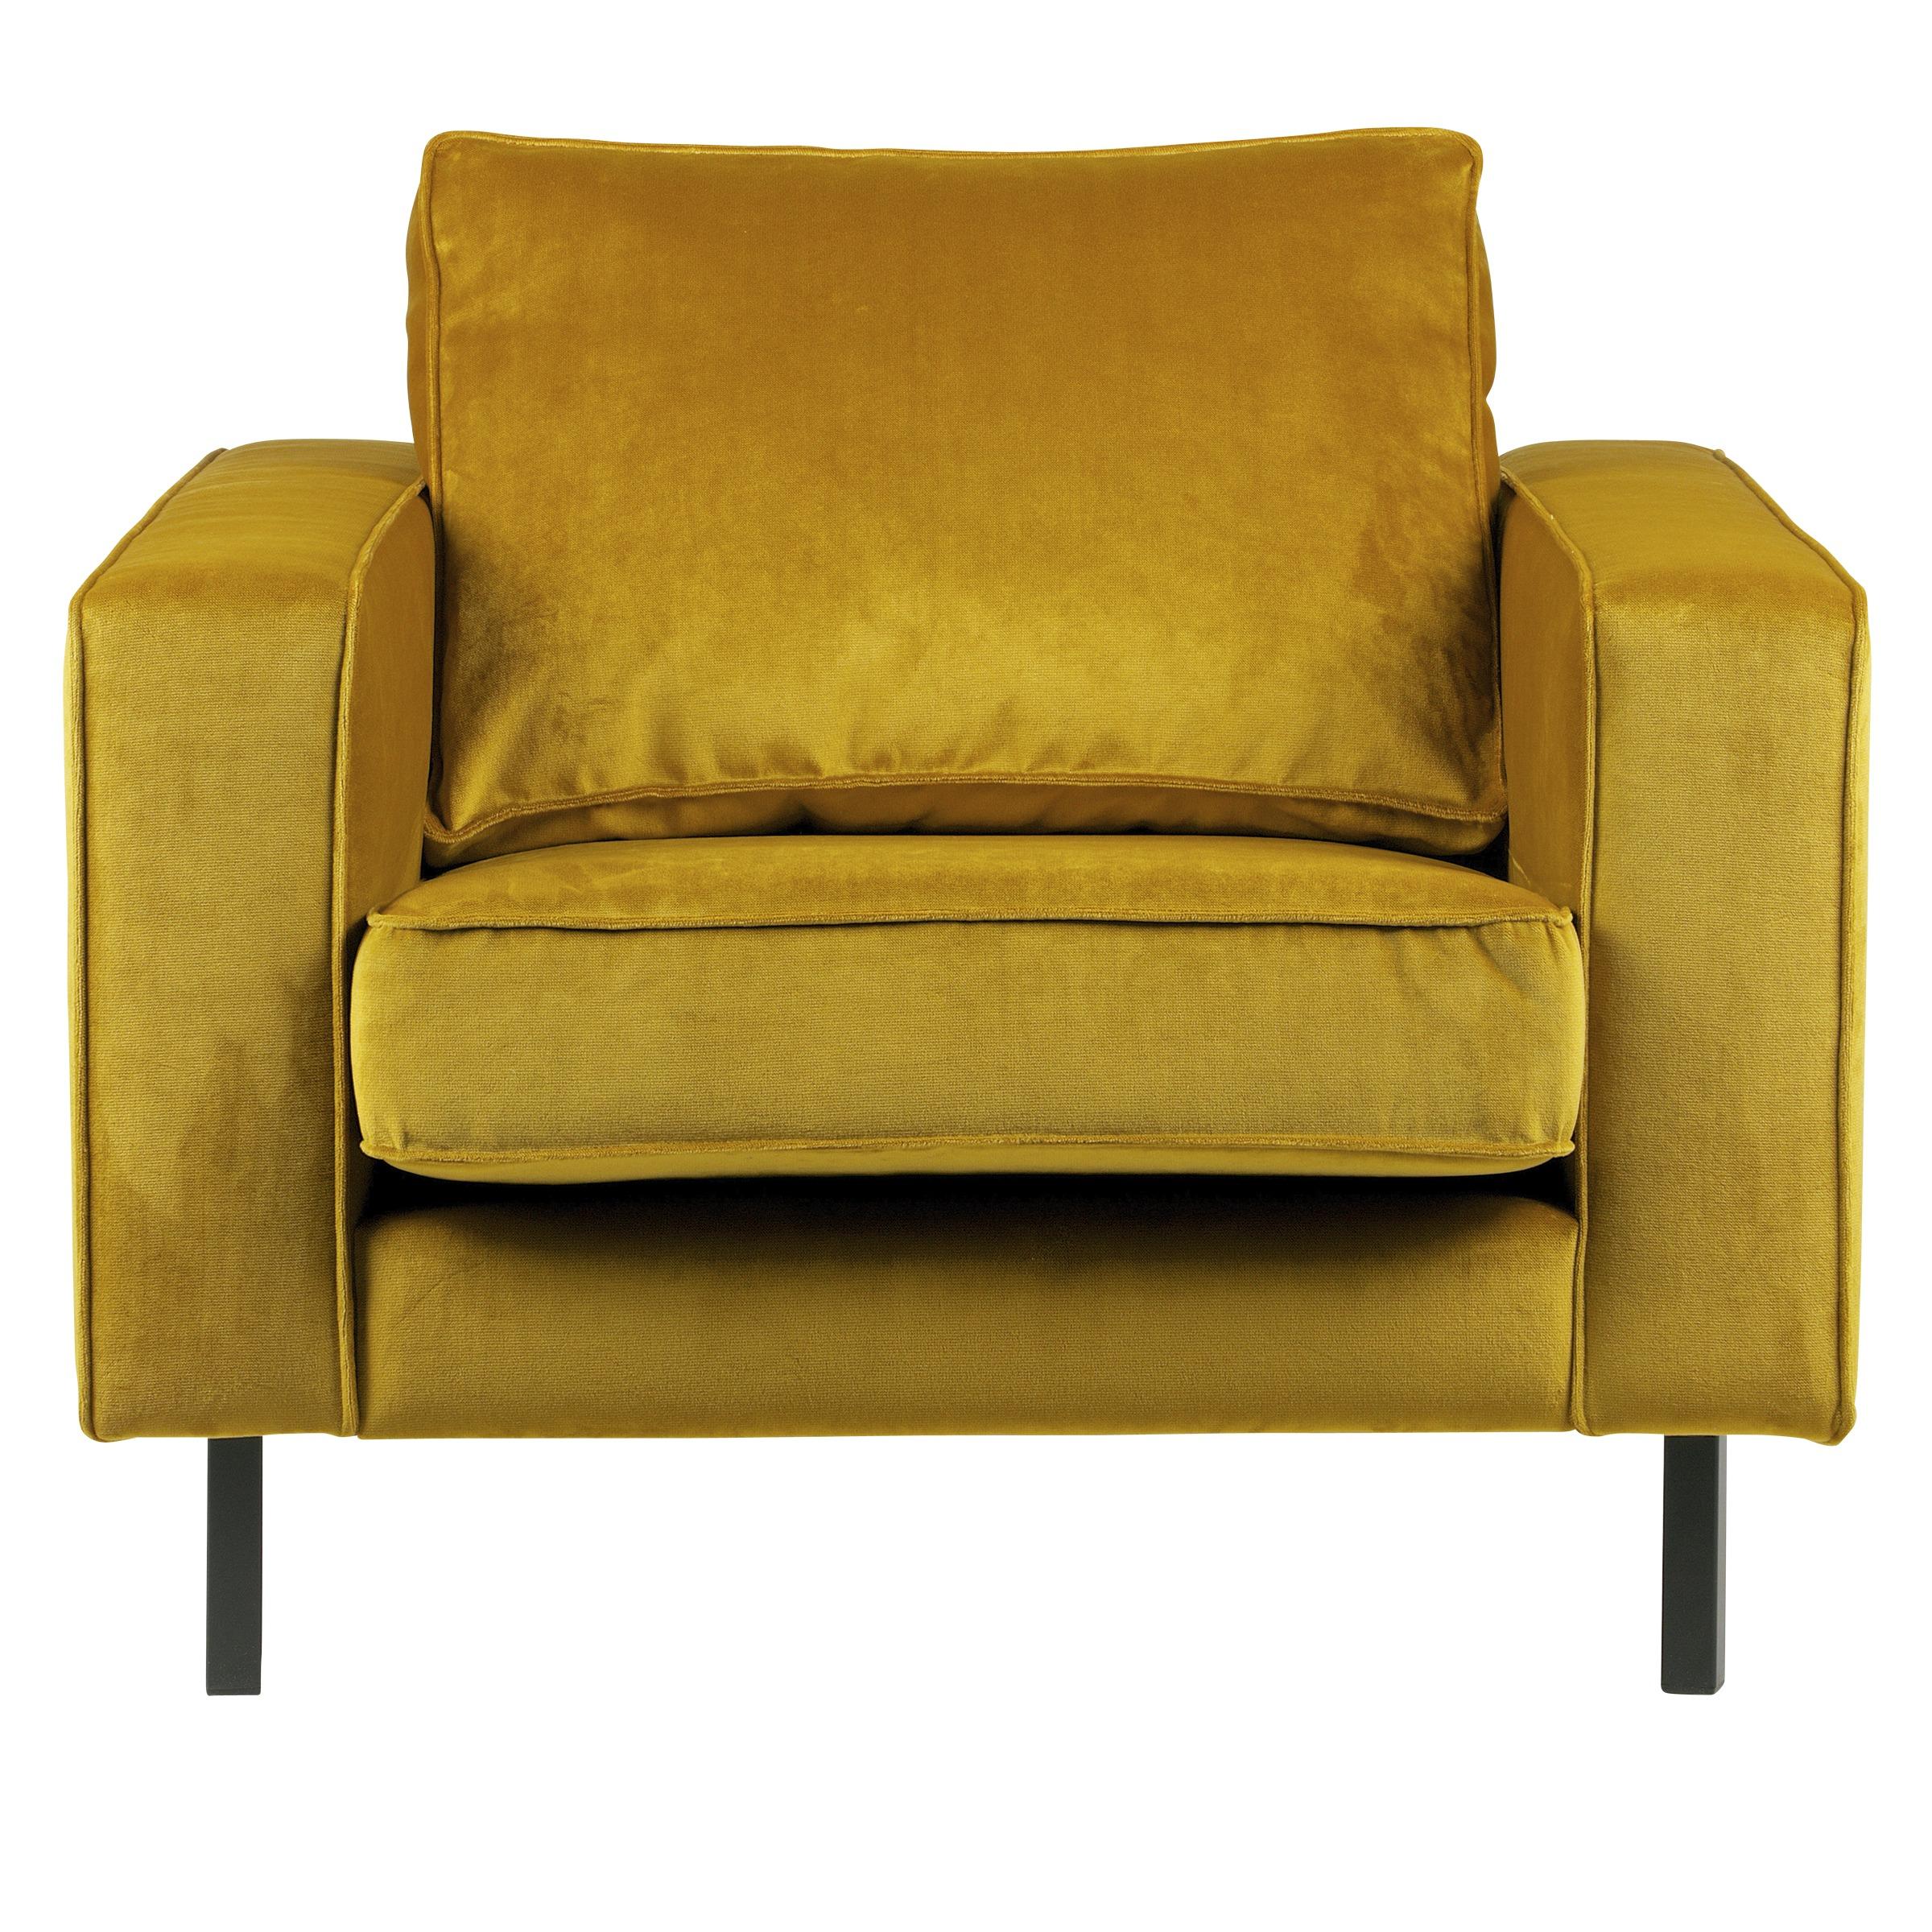 WOOOD fauteuil Robin fluweel gestoffeerd okergeel